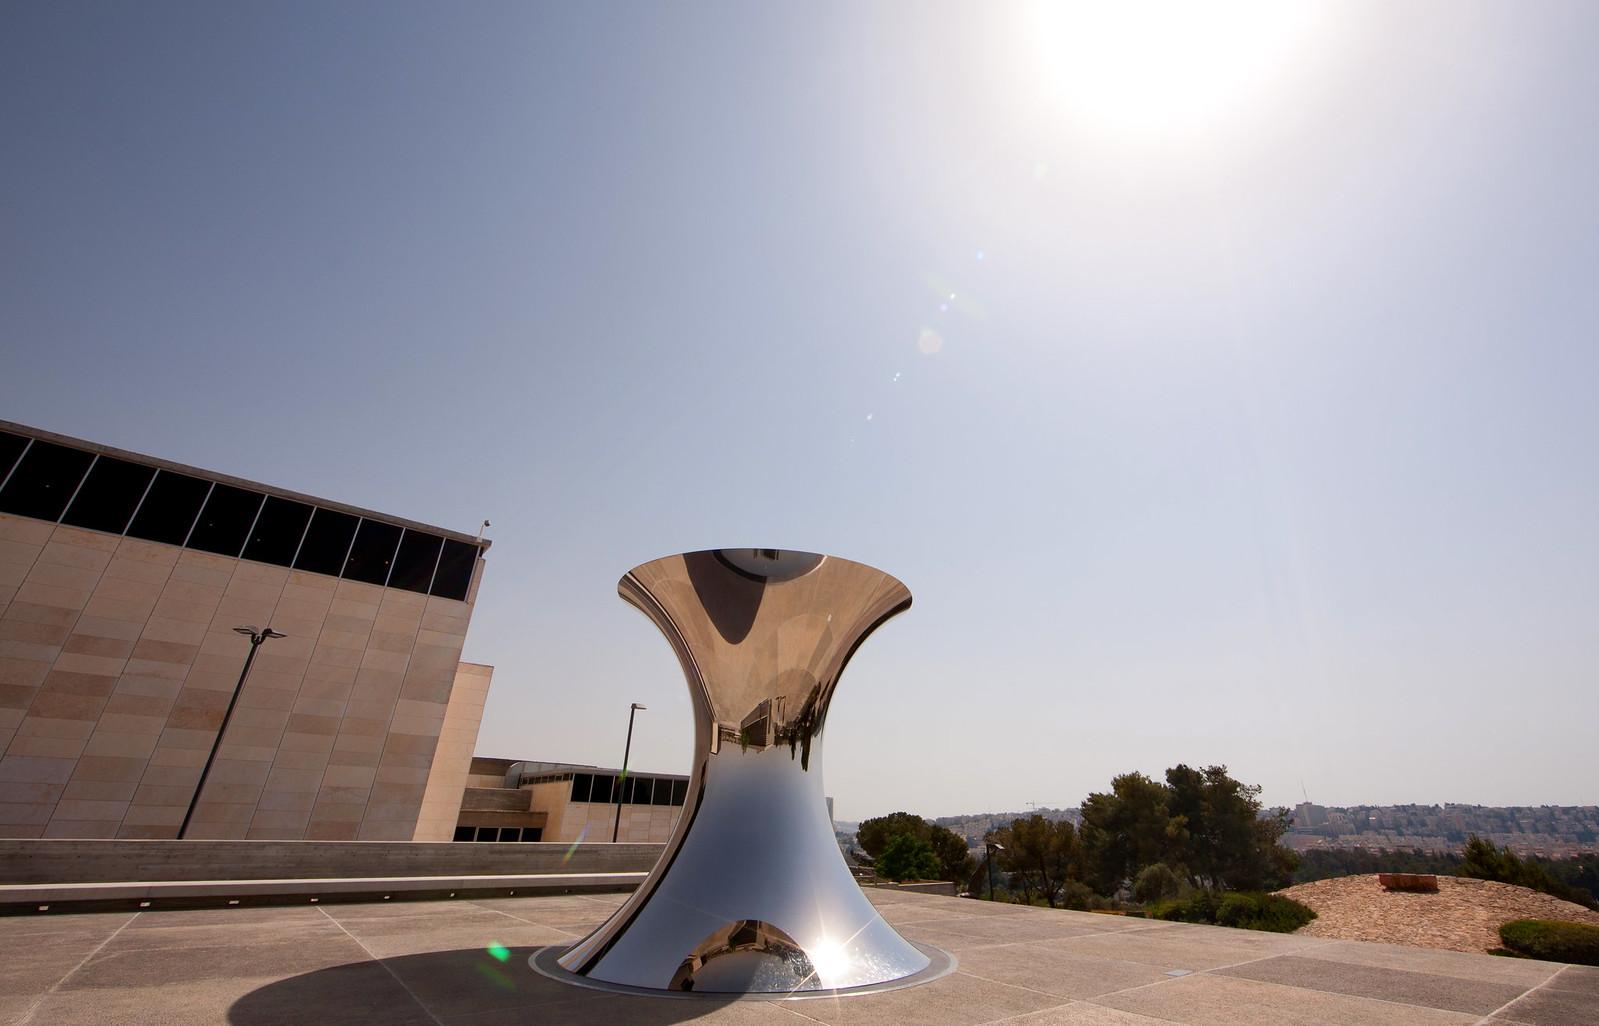 Jerusalem_ The Israel Museum_Turning the World Upside Down 2